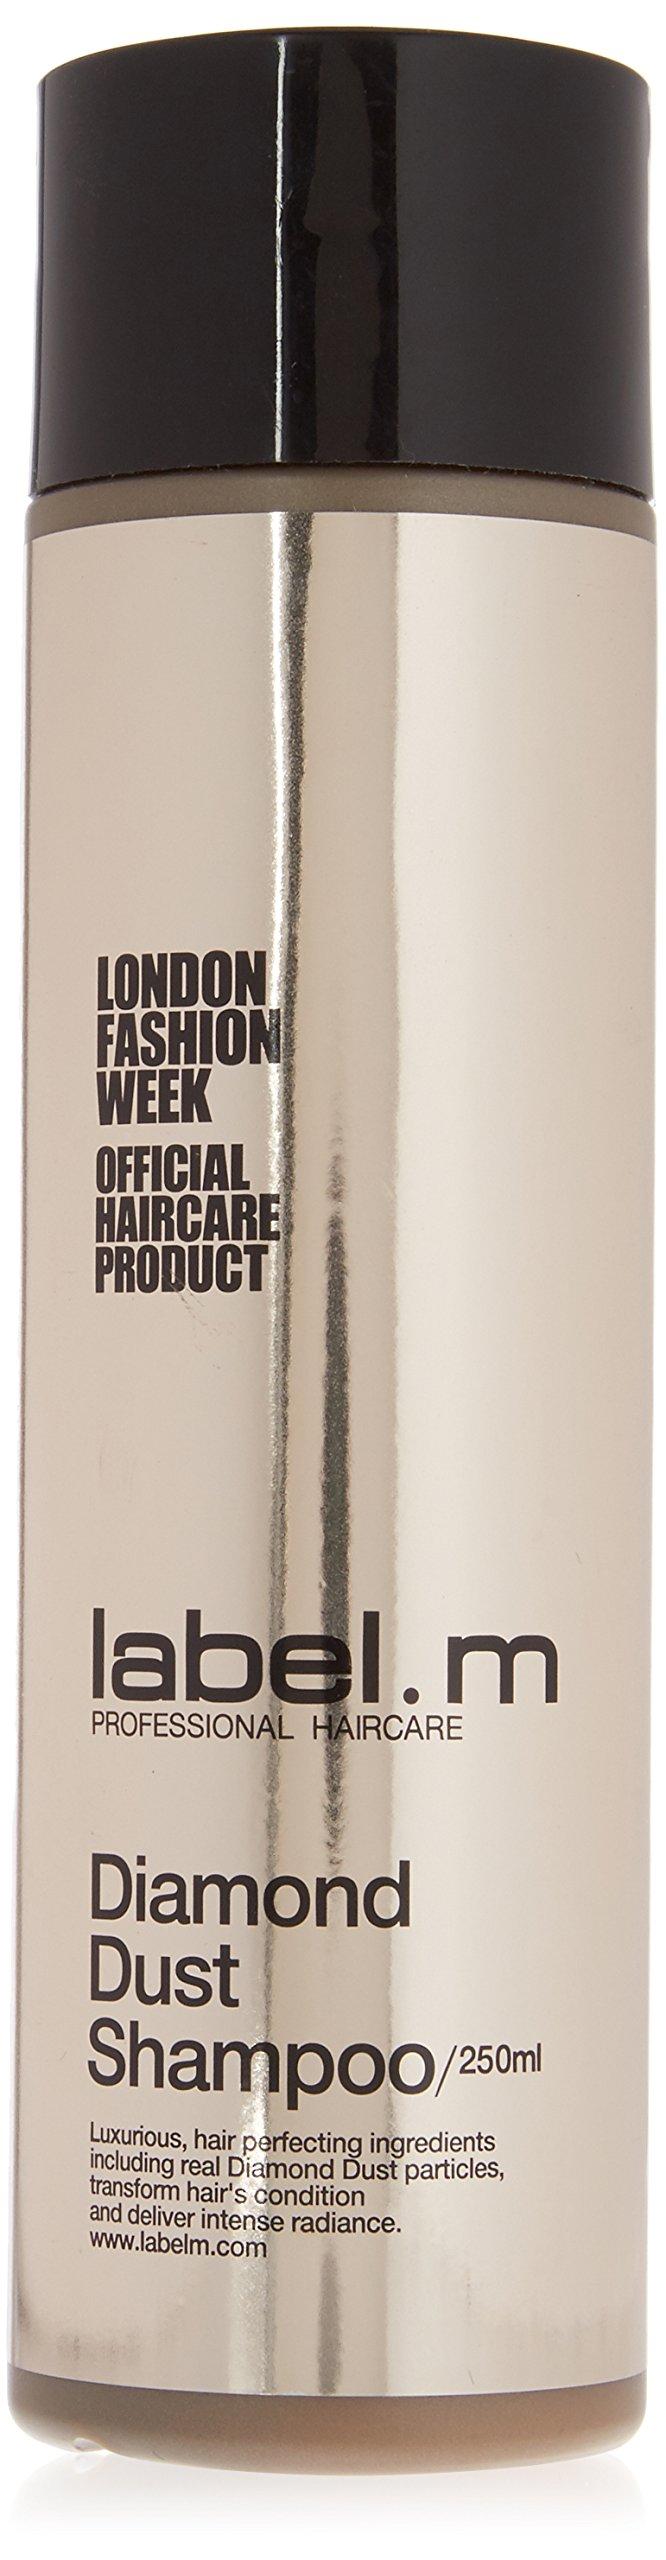 Label.m Diamond Dust Shampoo, 250 ML